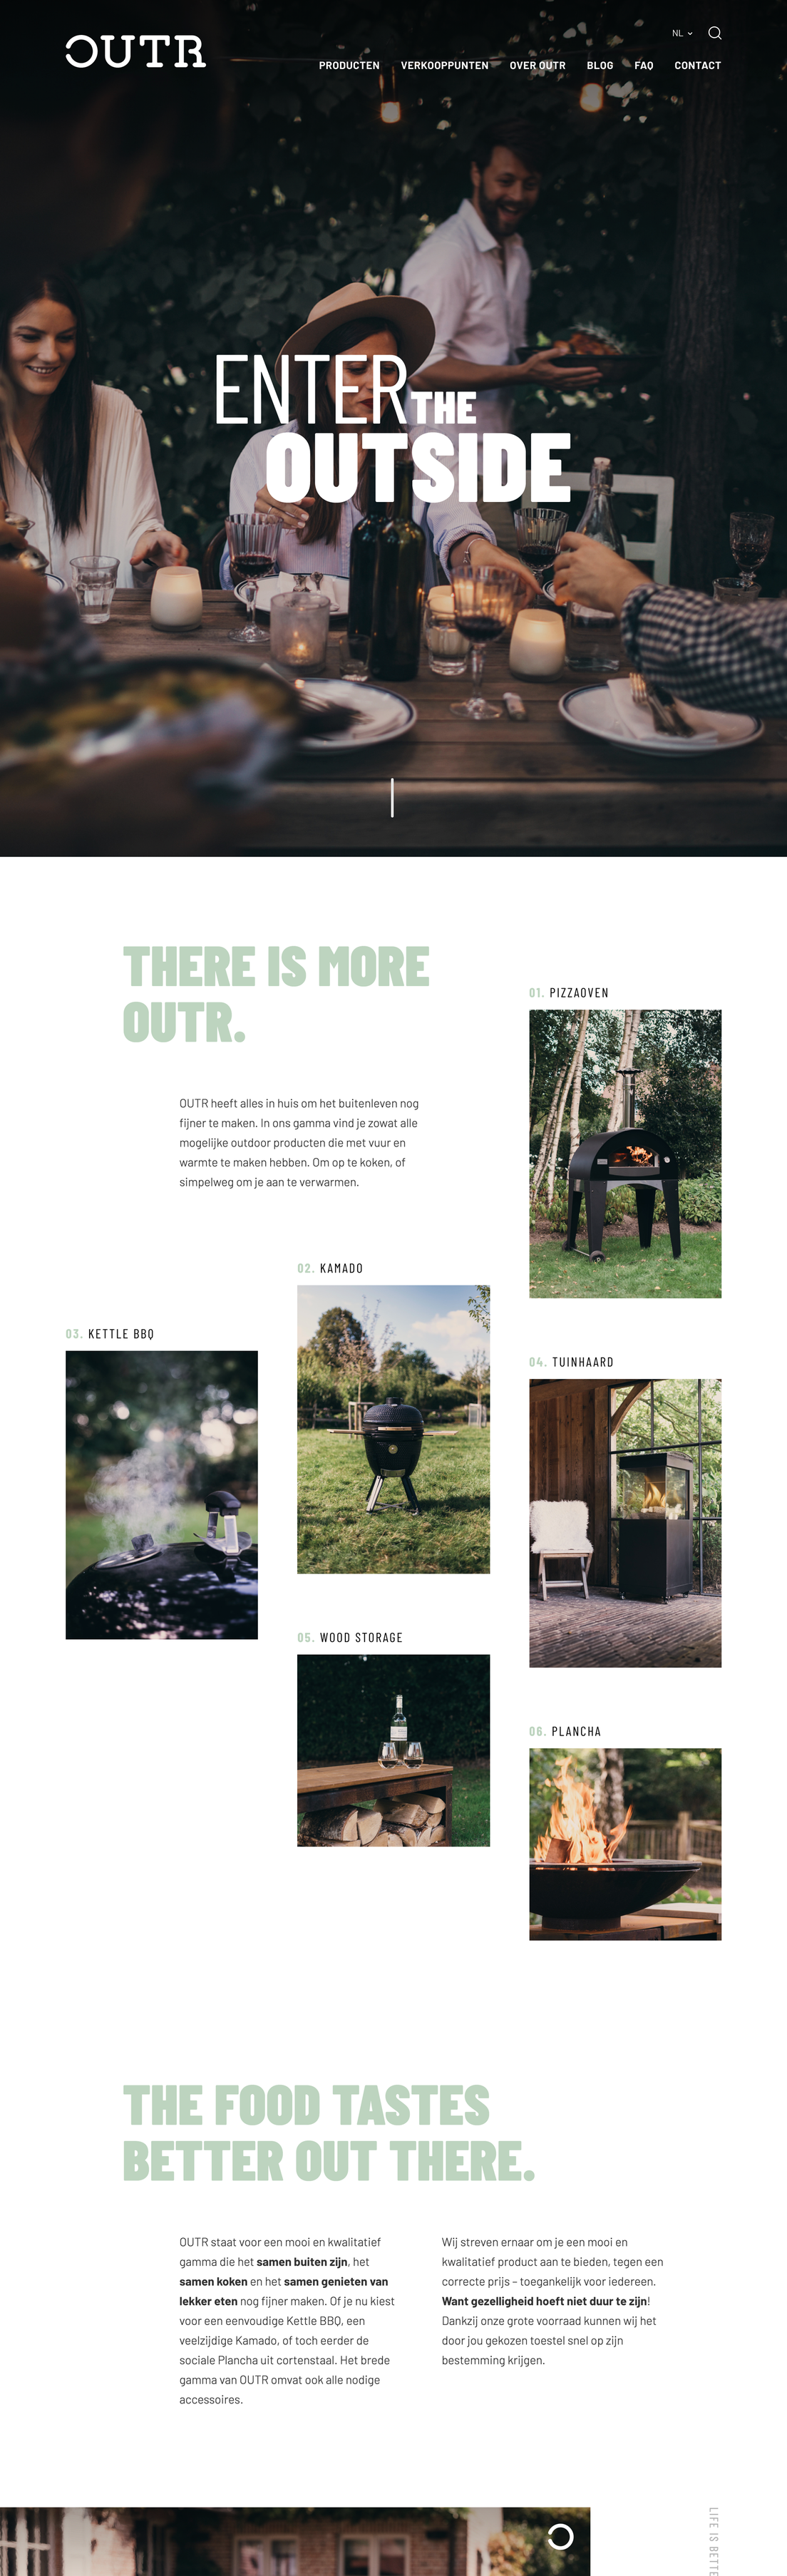 Showcase Webatvantage - Project Outr - Homepagina